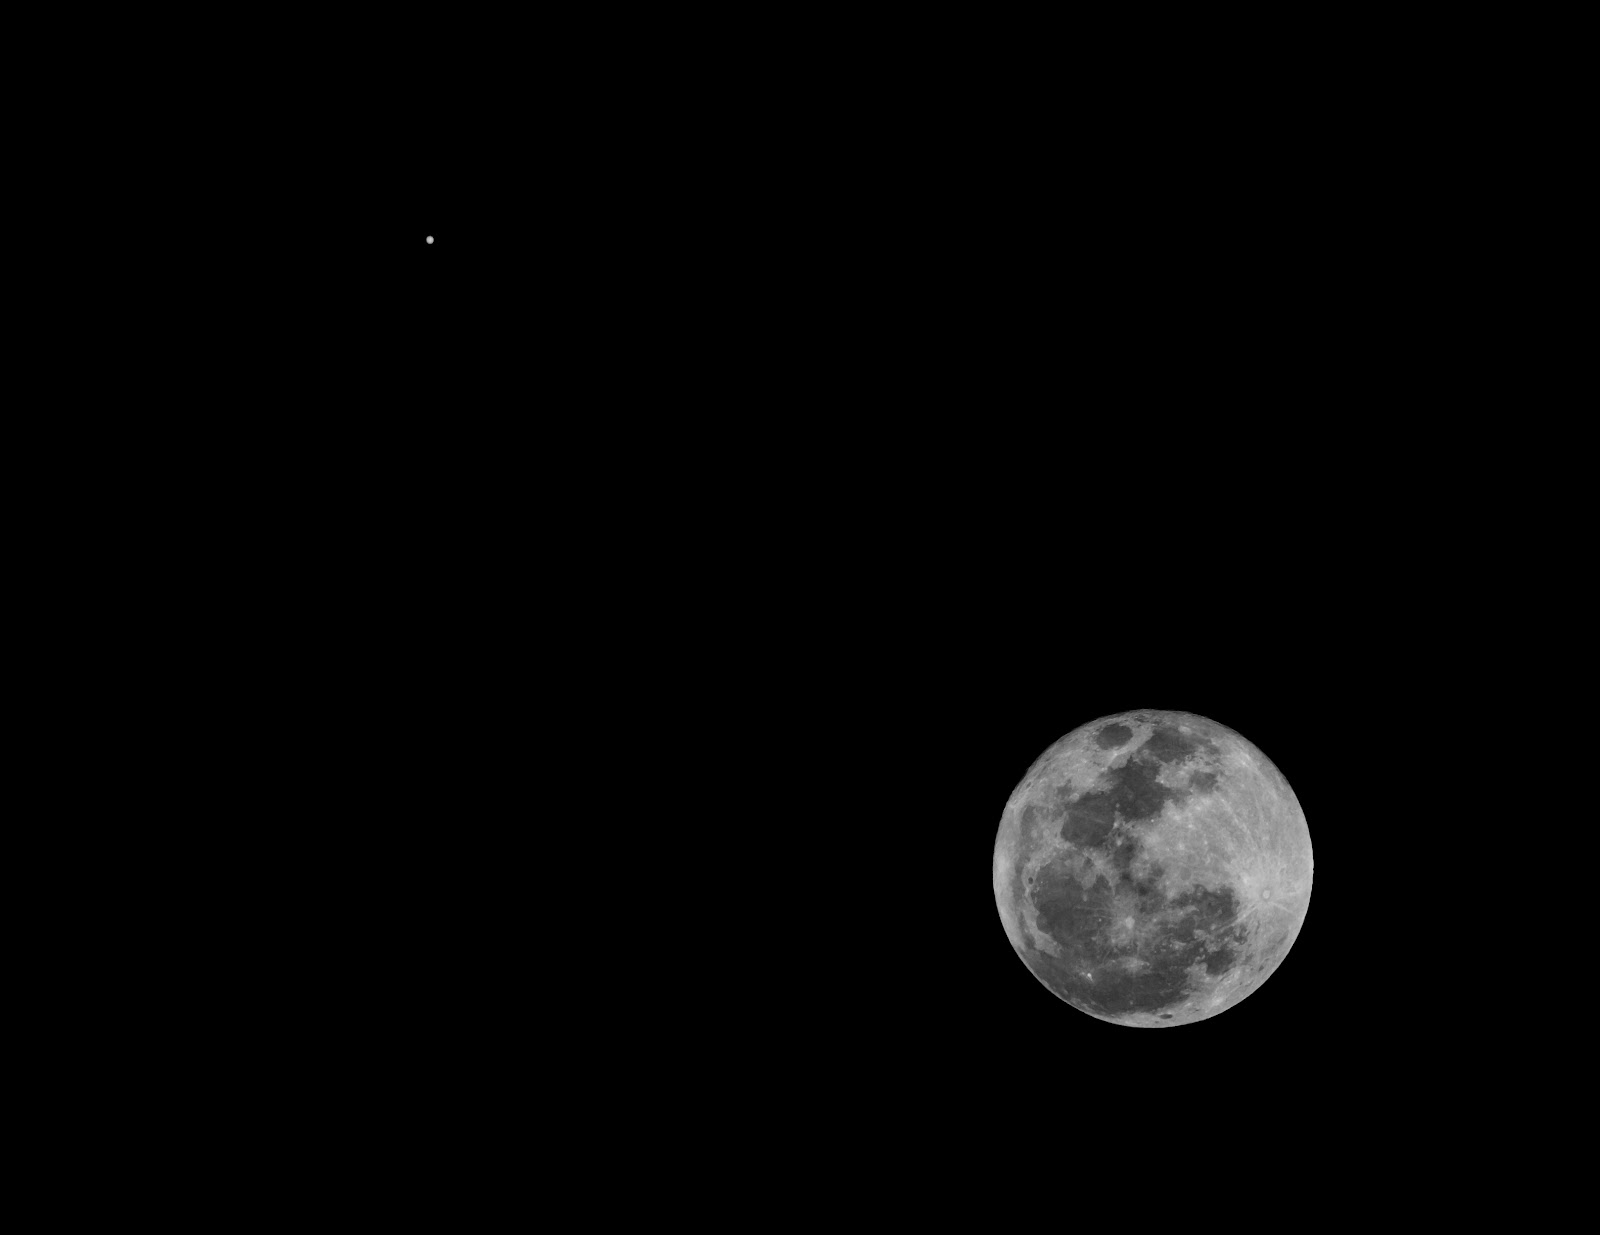 Edward Plumer: Conjunction of Moon and Jupiter